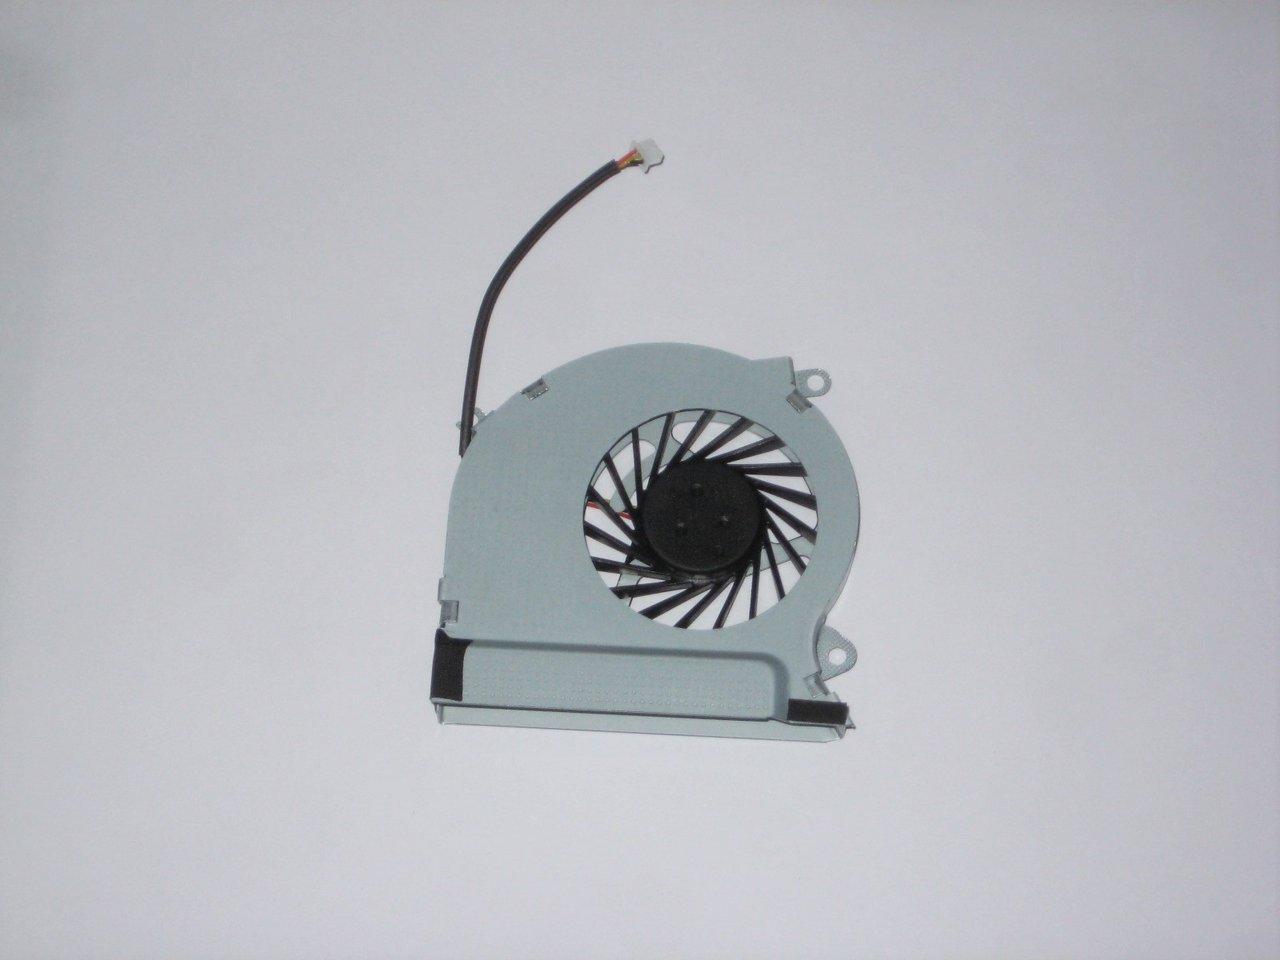 AAVID PAAD06015SL Kühler Lüfter für MSI GE70 Notebook